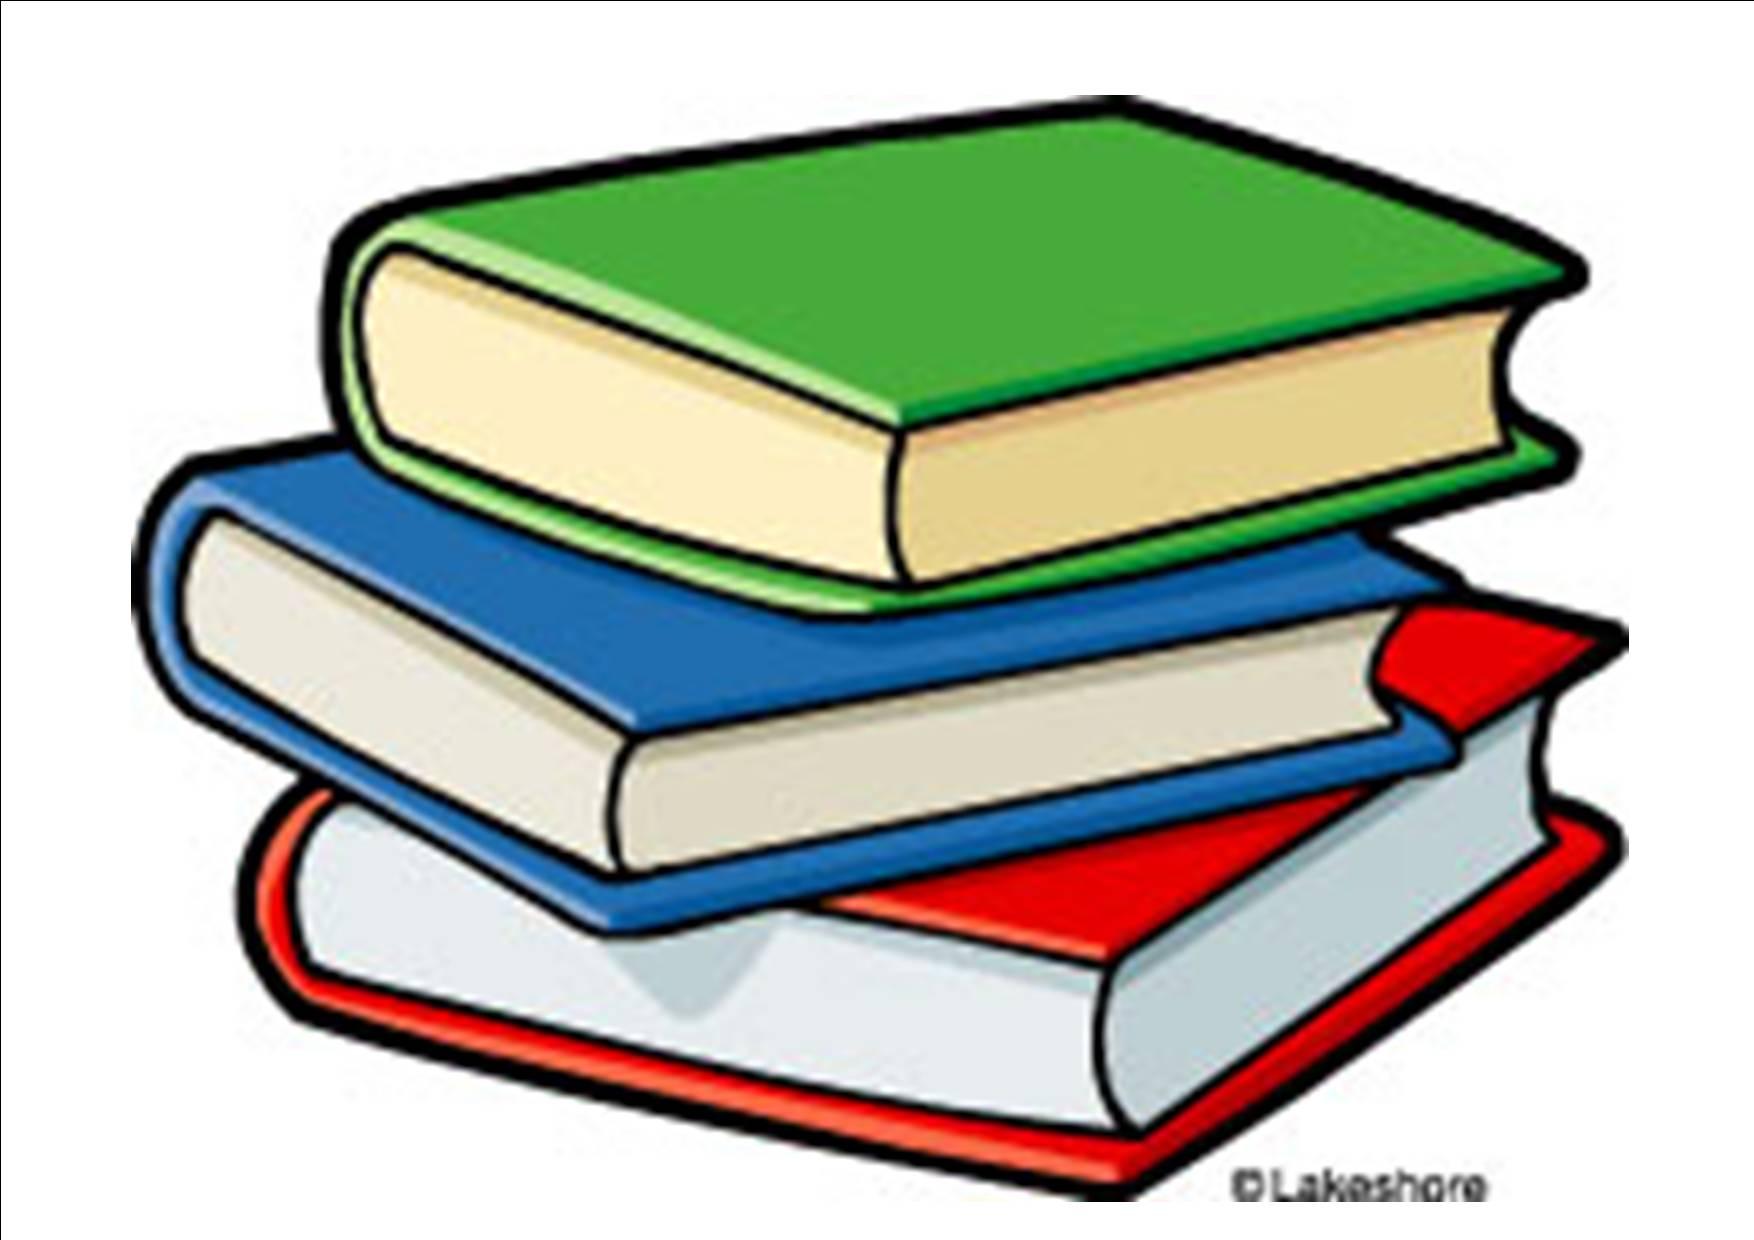 Book Clip Art: 10 reading book clipart.